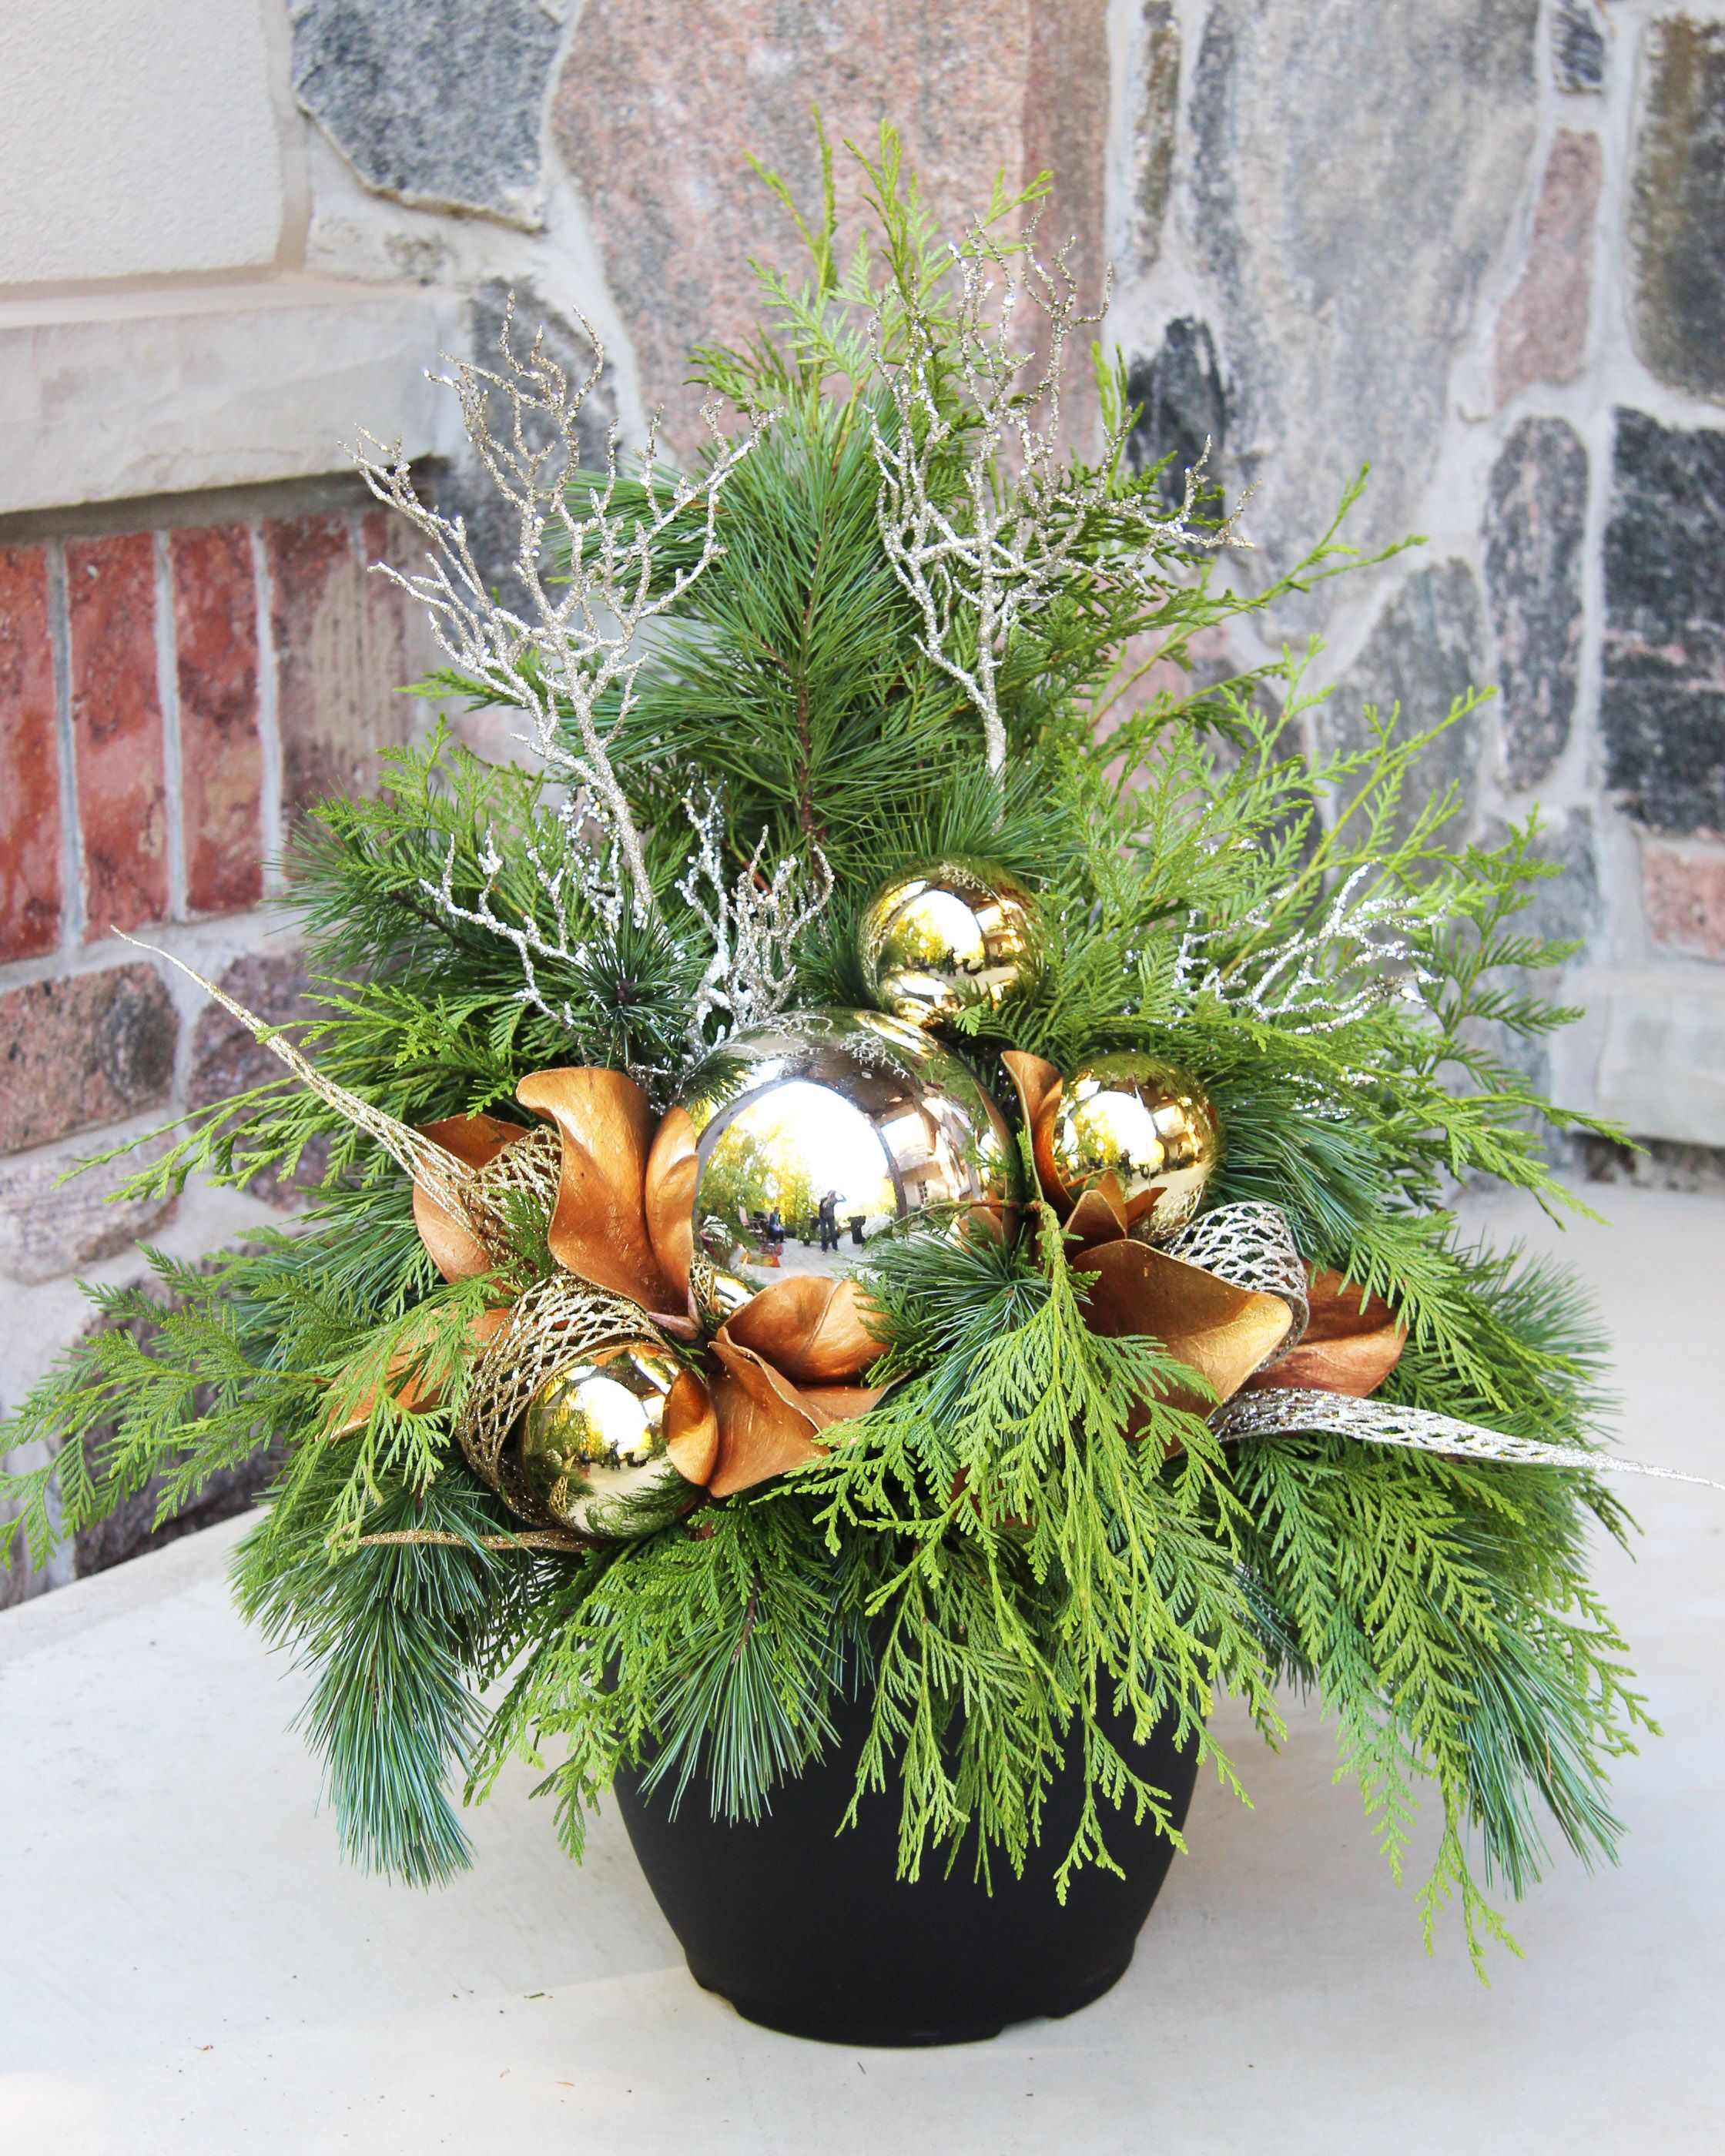 Outdoor christmas planter flower arangements pinterest - Decorations de noel exterieur ...